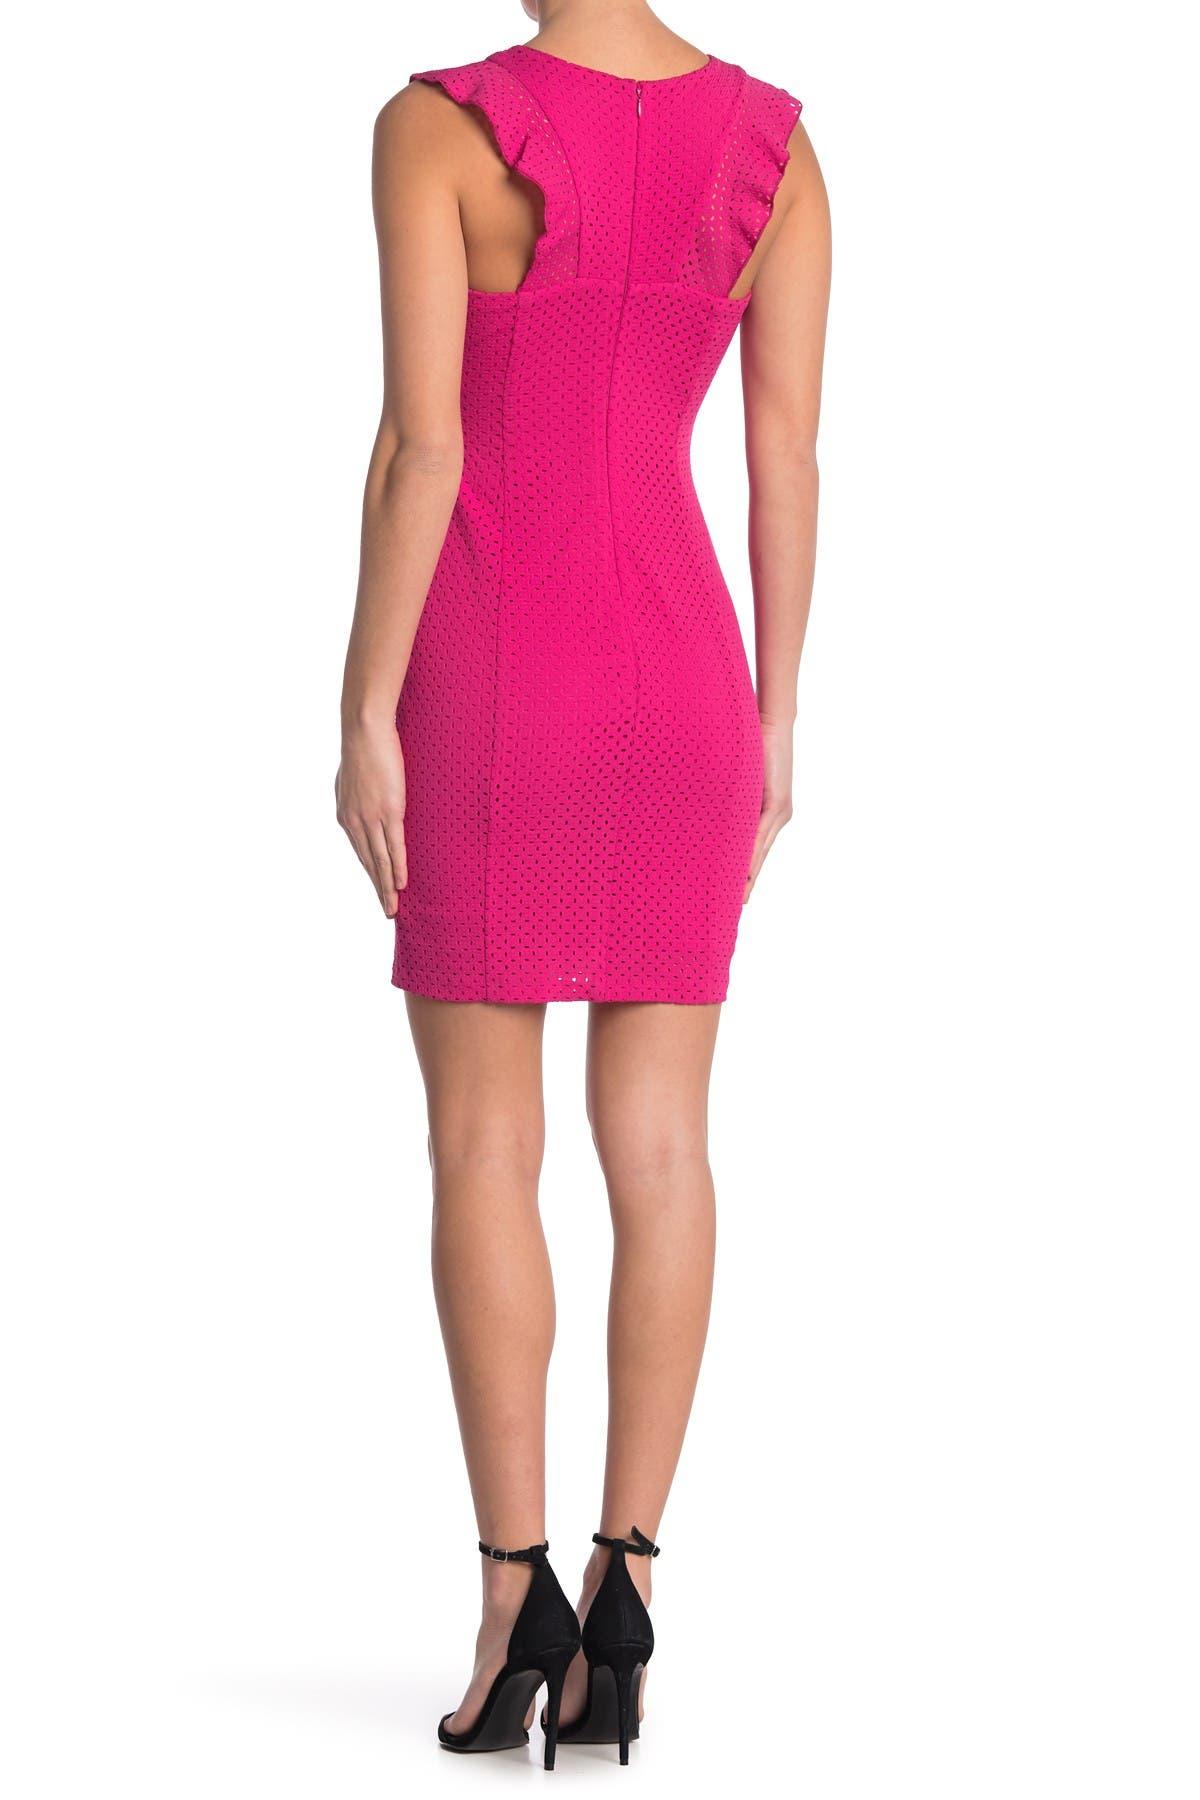 Image of GUESS Crisscross Ruffle Sleeveless Dress